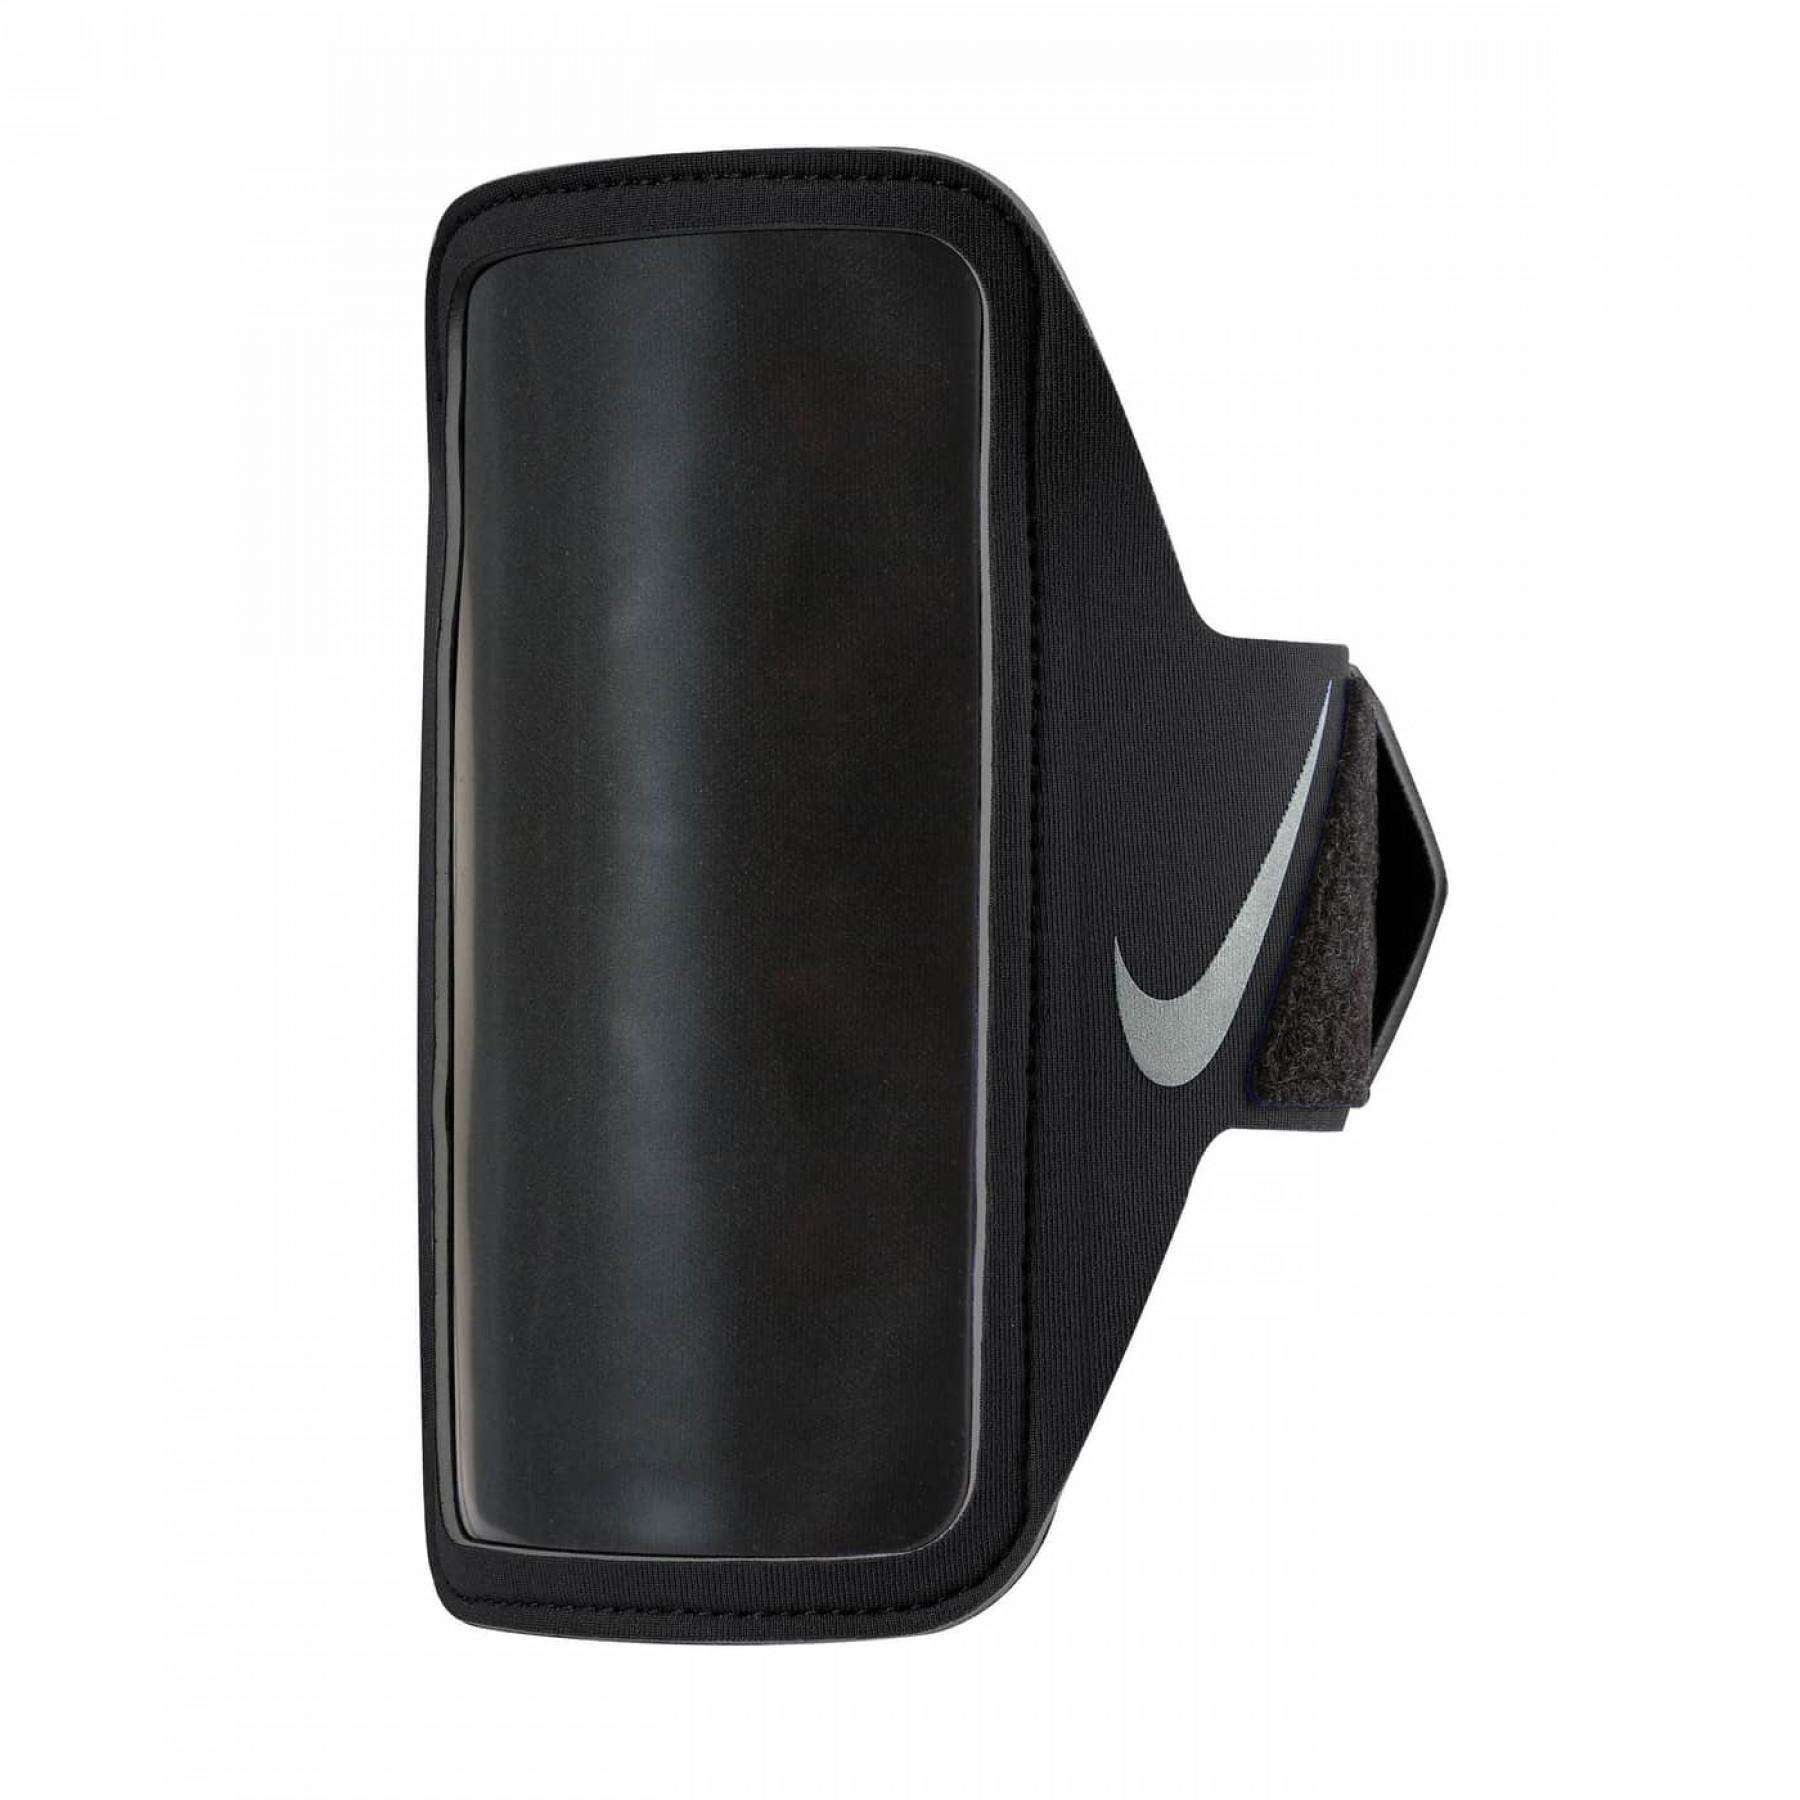 Nike lean running cuff